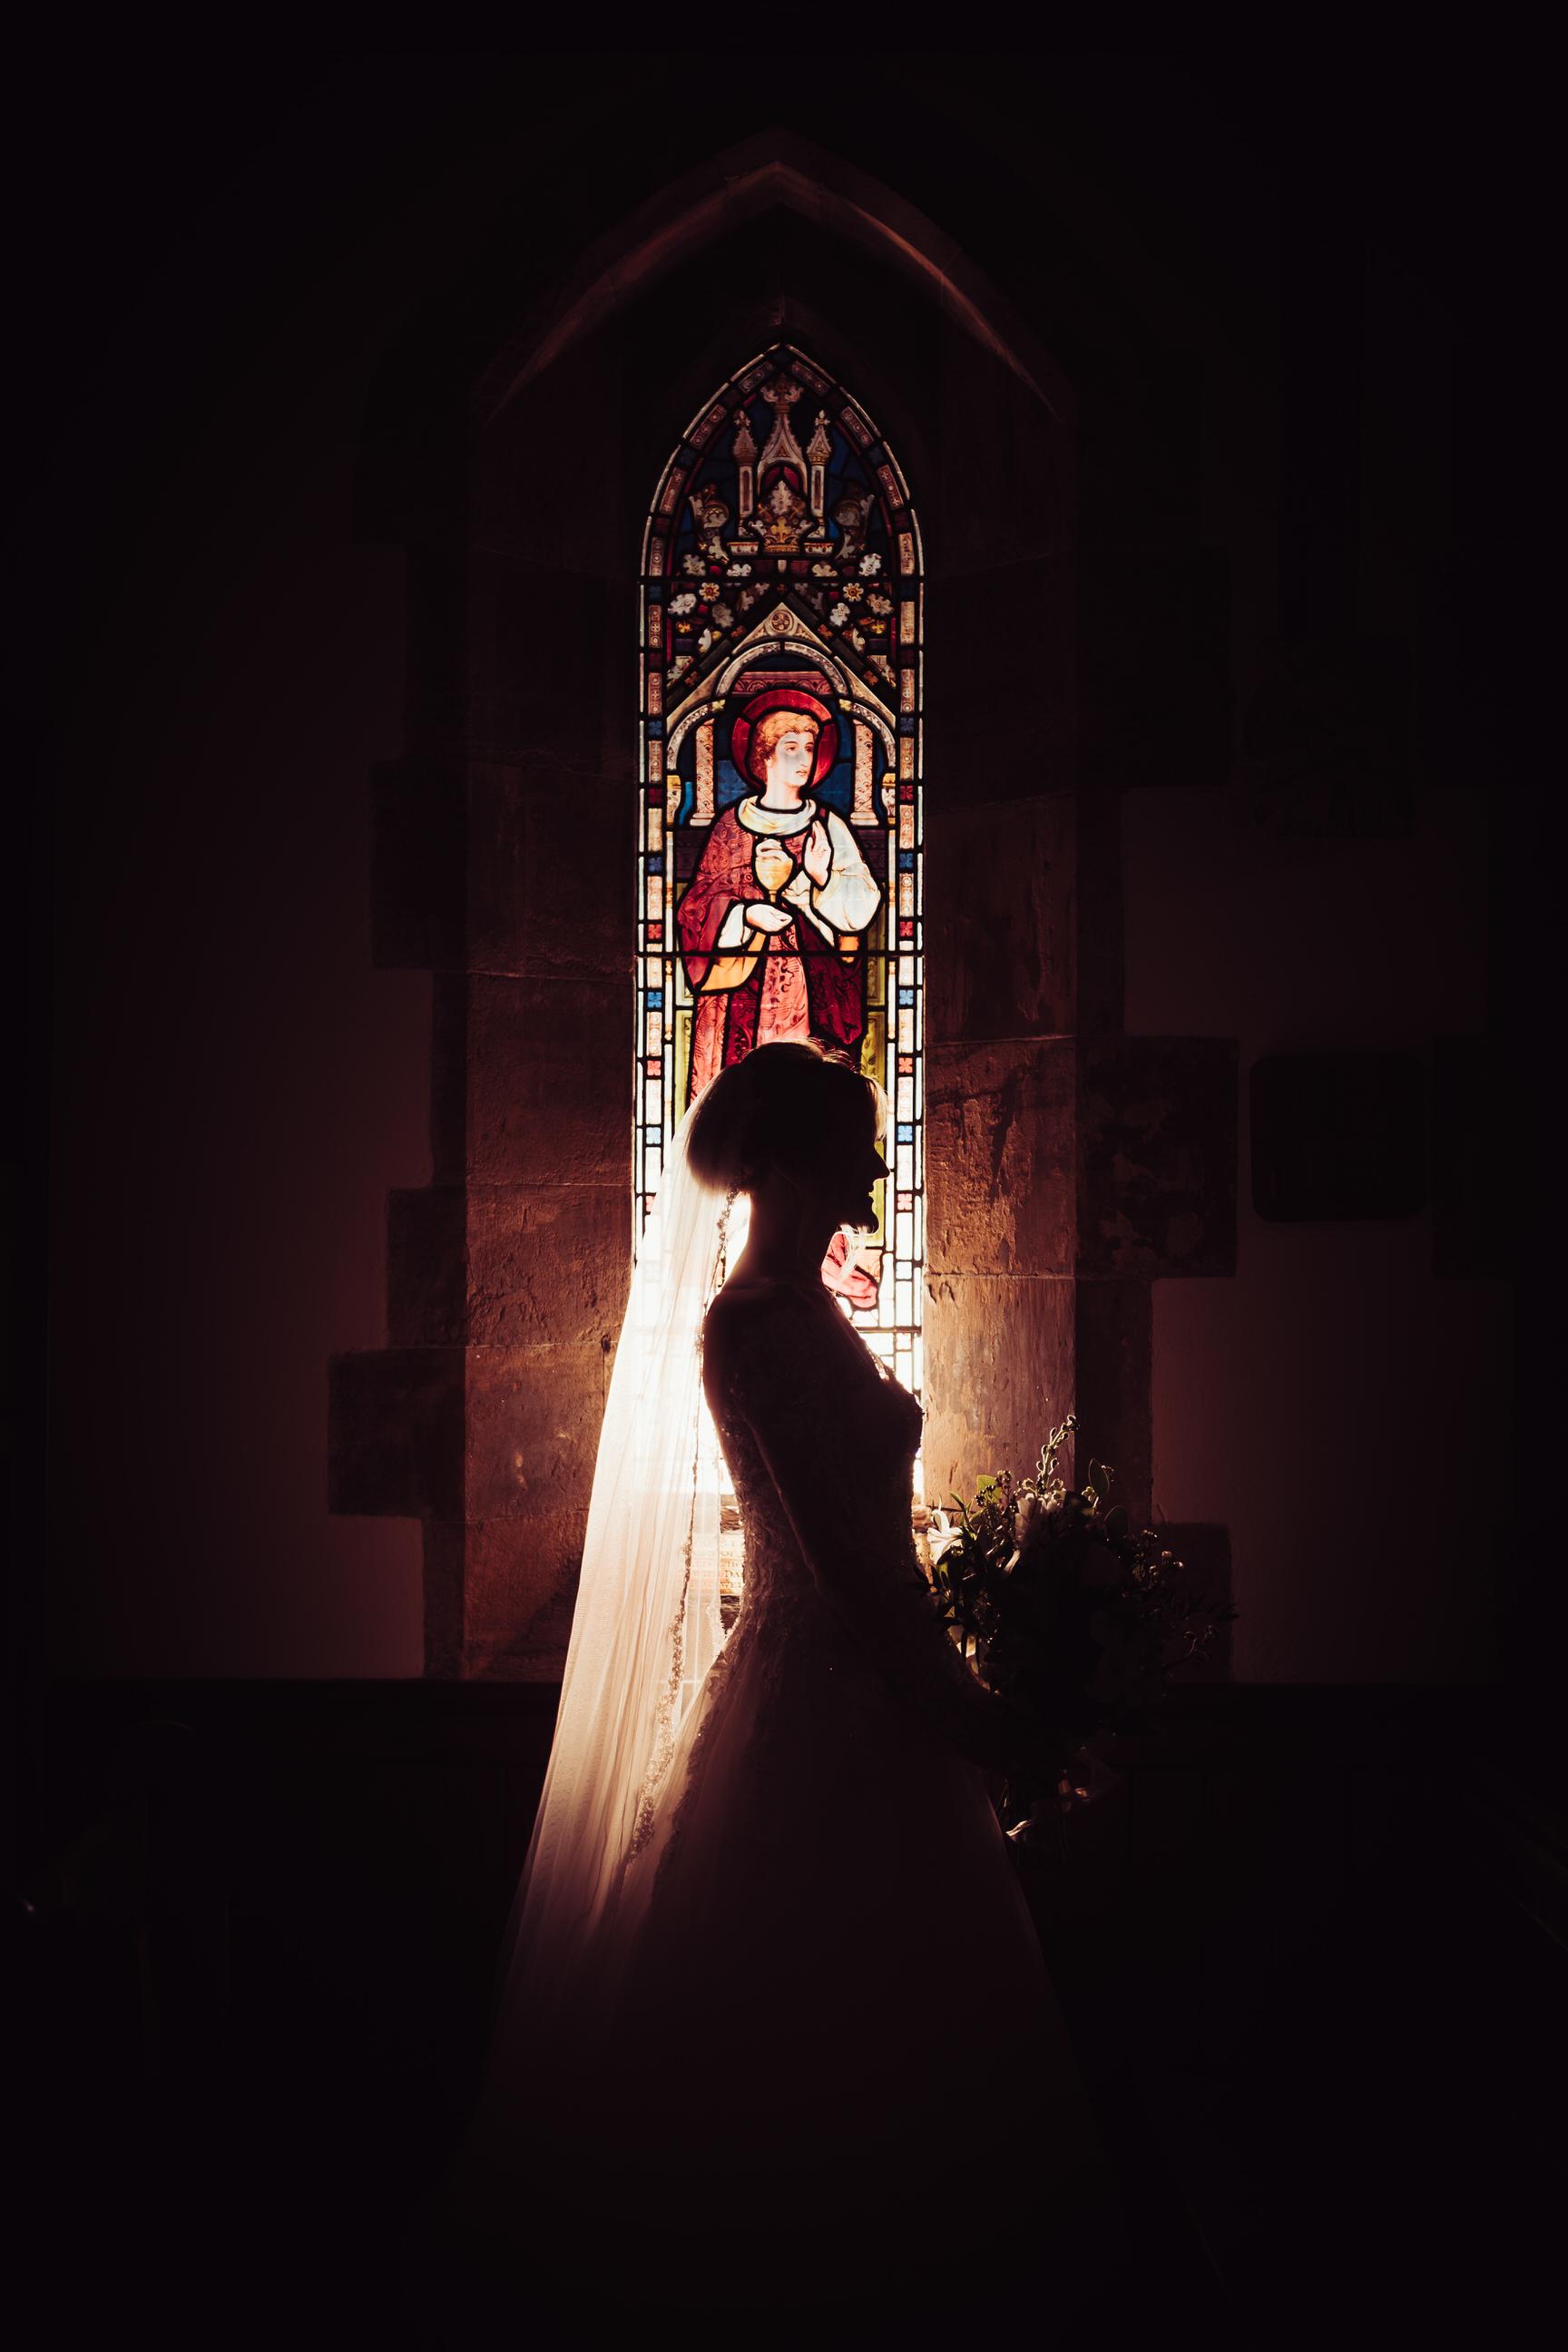 The-Grand-Hotel-York-wedding-photographer-7.jpg